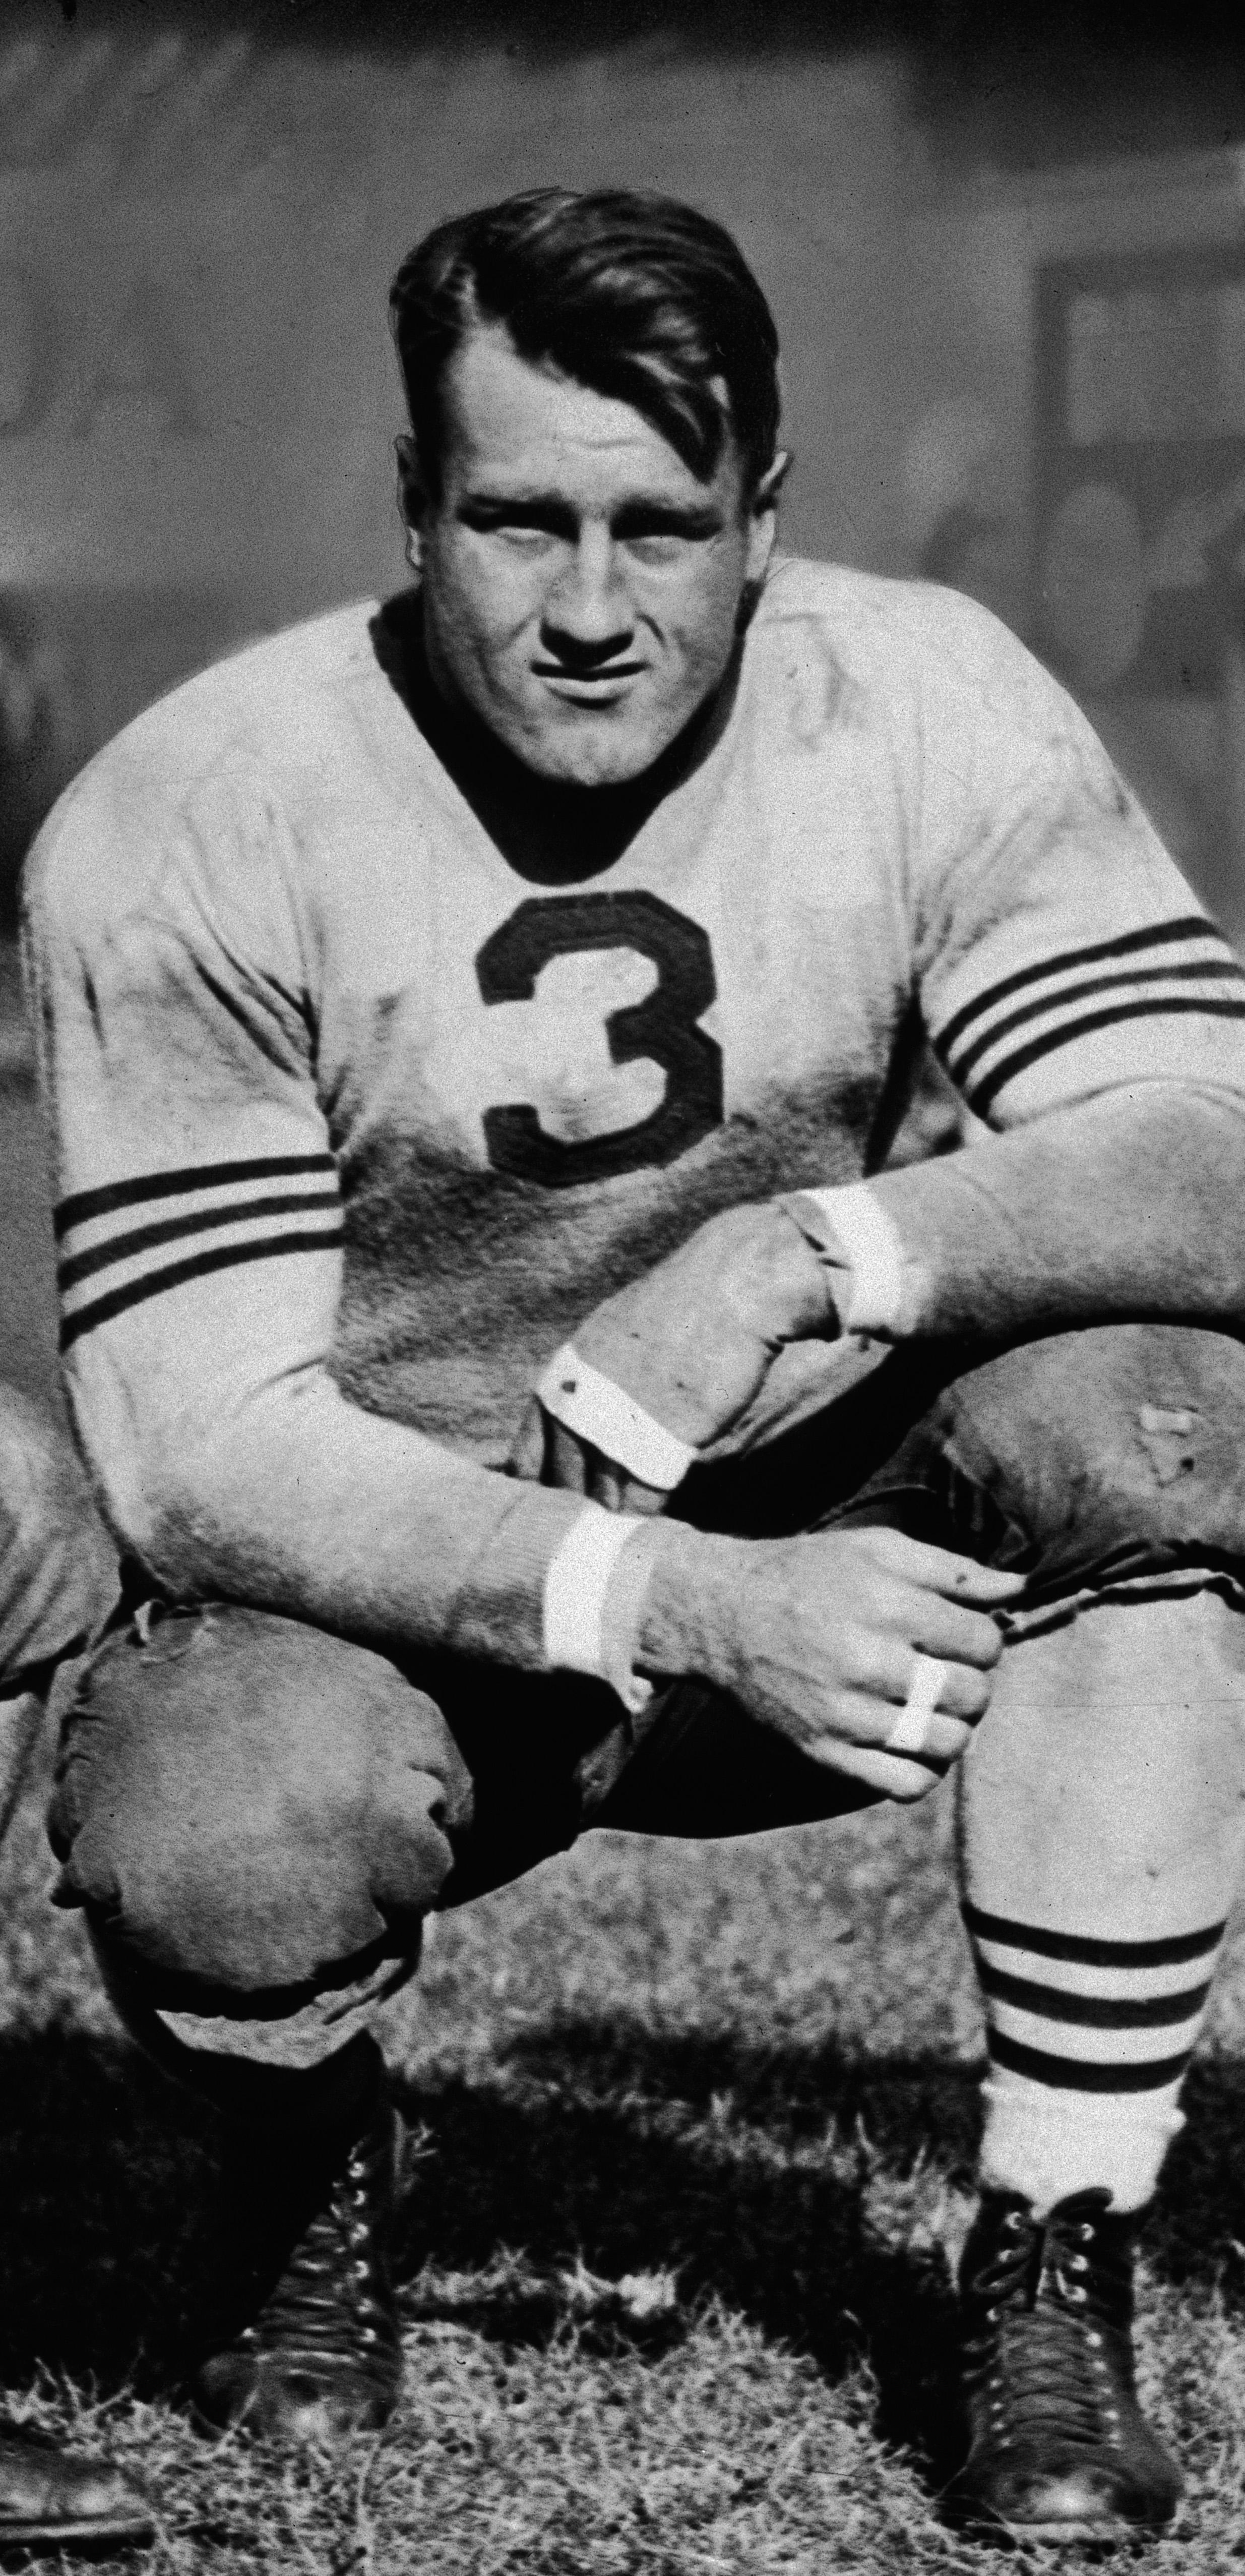 'Bronko' Nagurski In Chicago Bears Uniform, 1933.